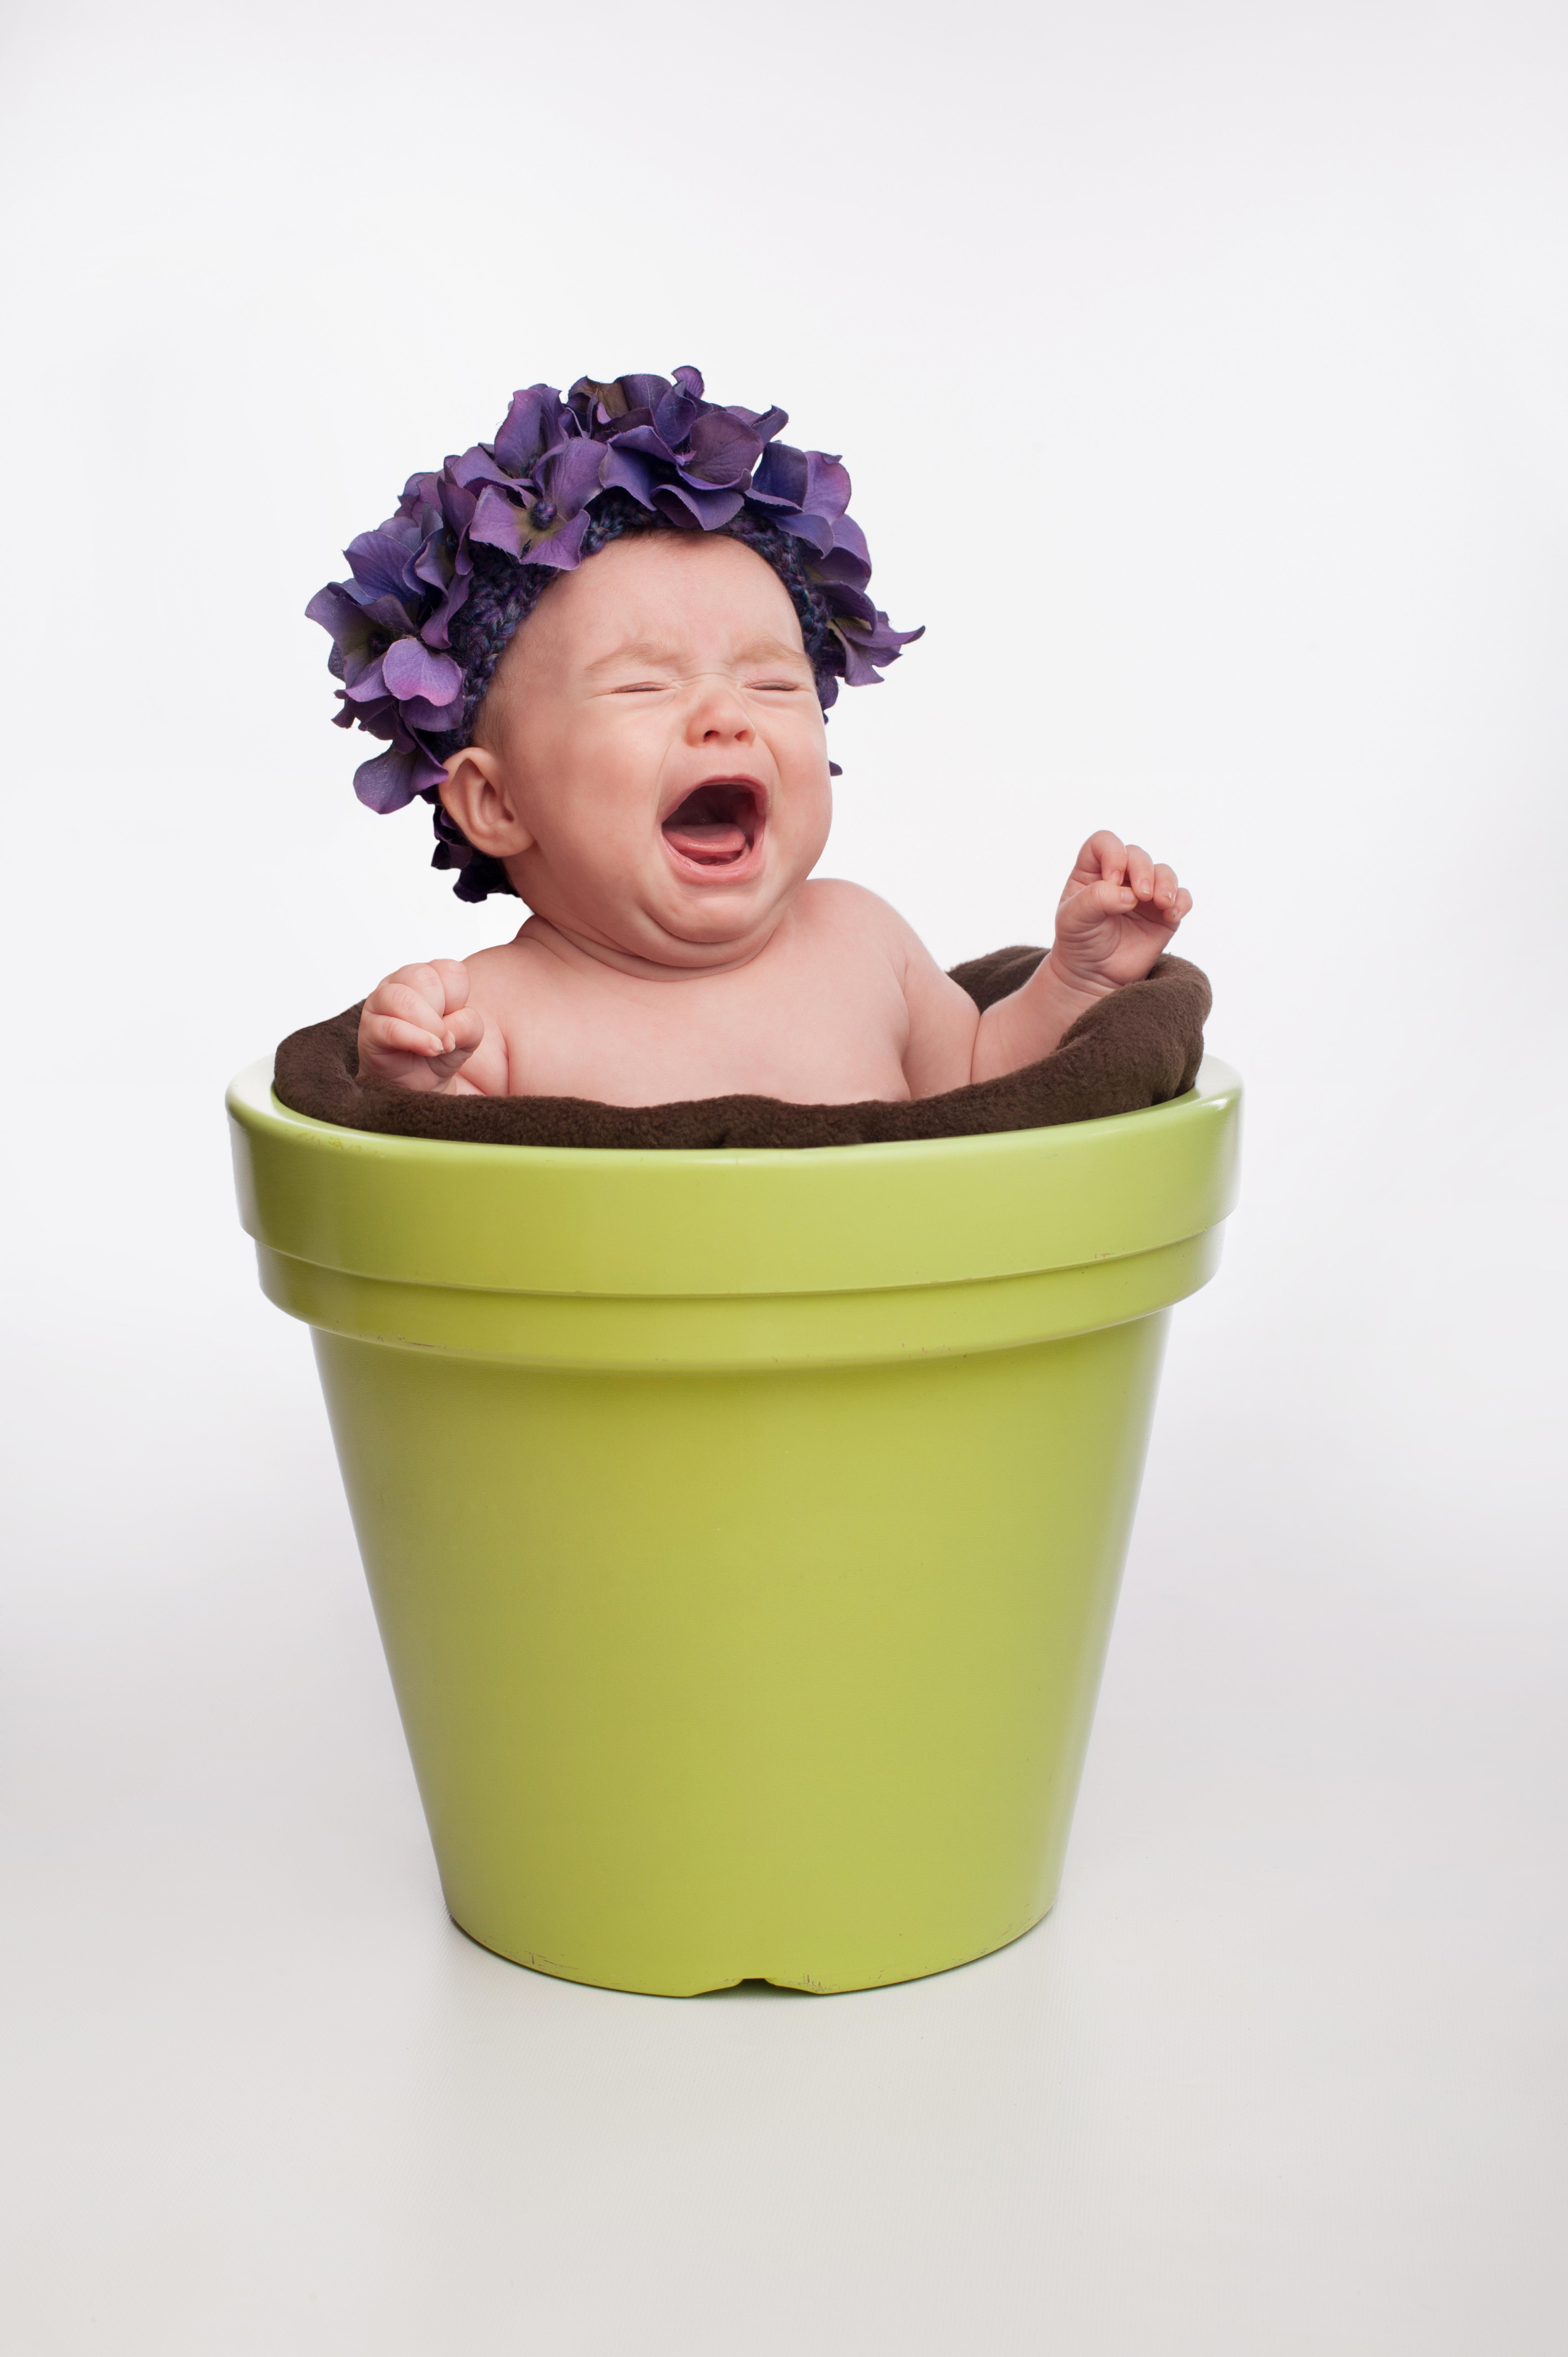 Ребенок на горшке: фото и картинки ребенок на горшке 73